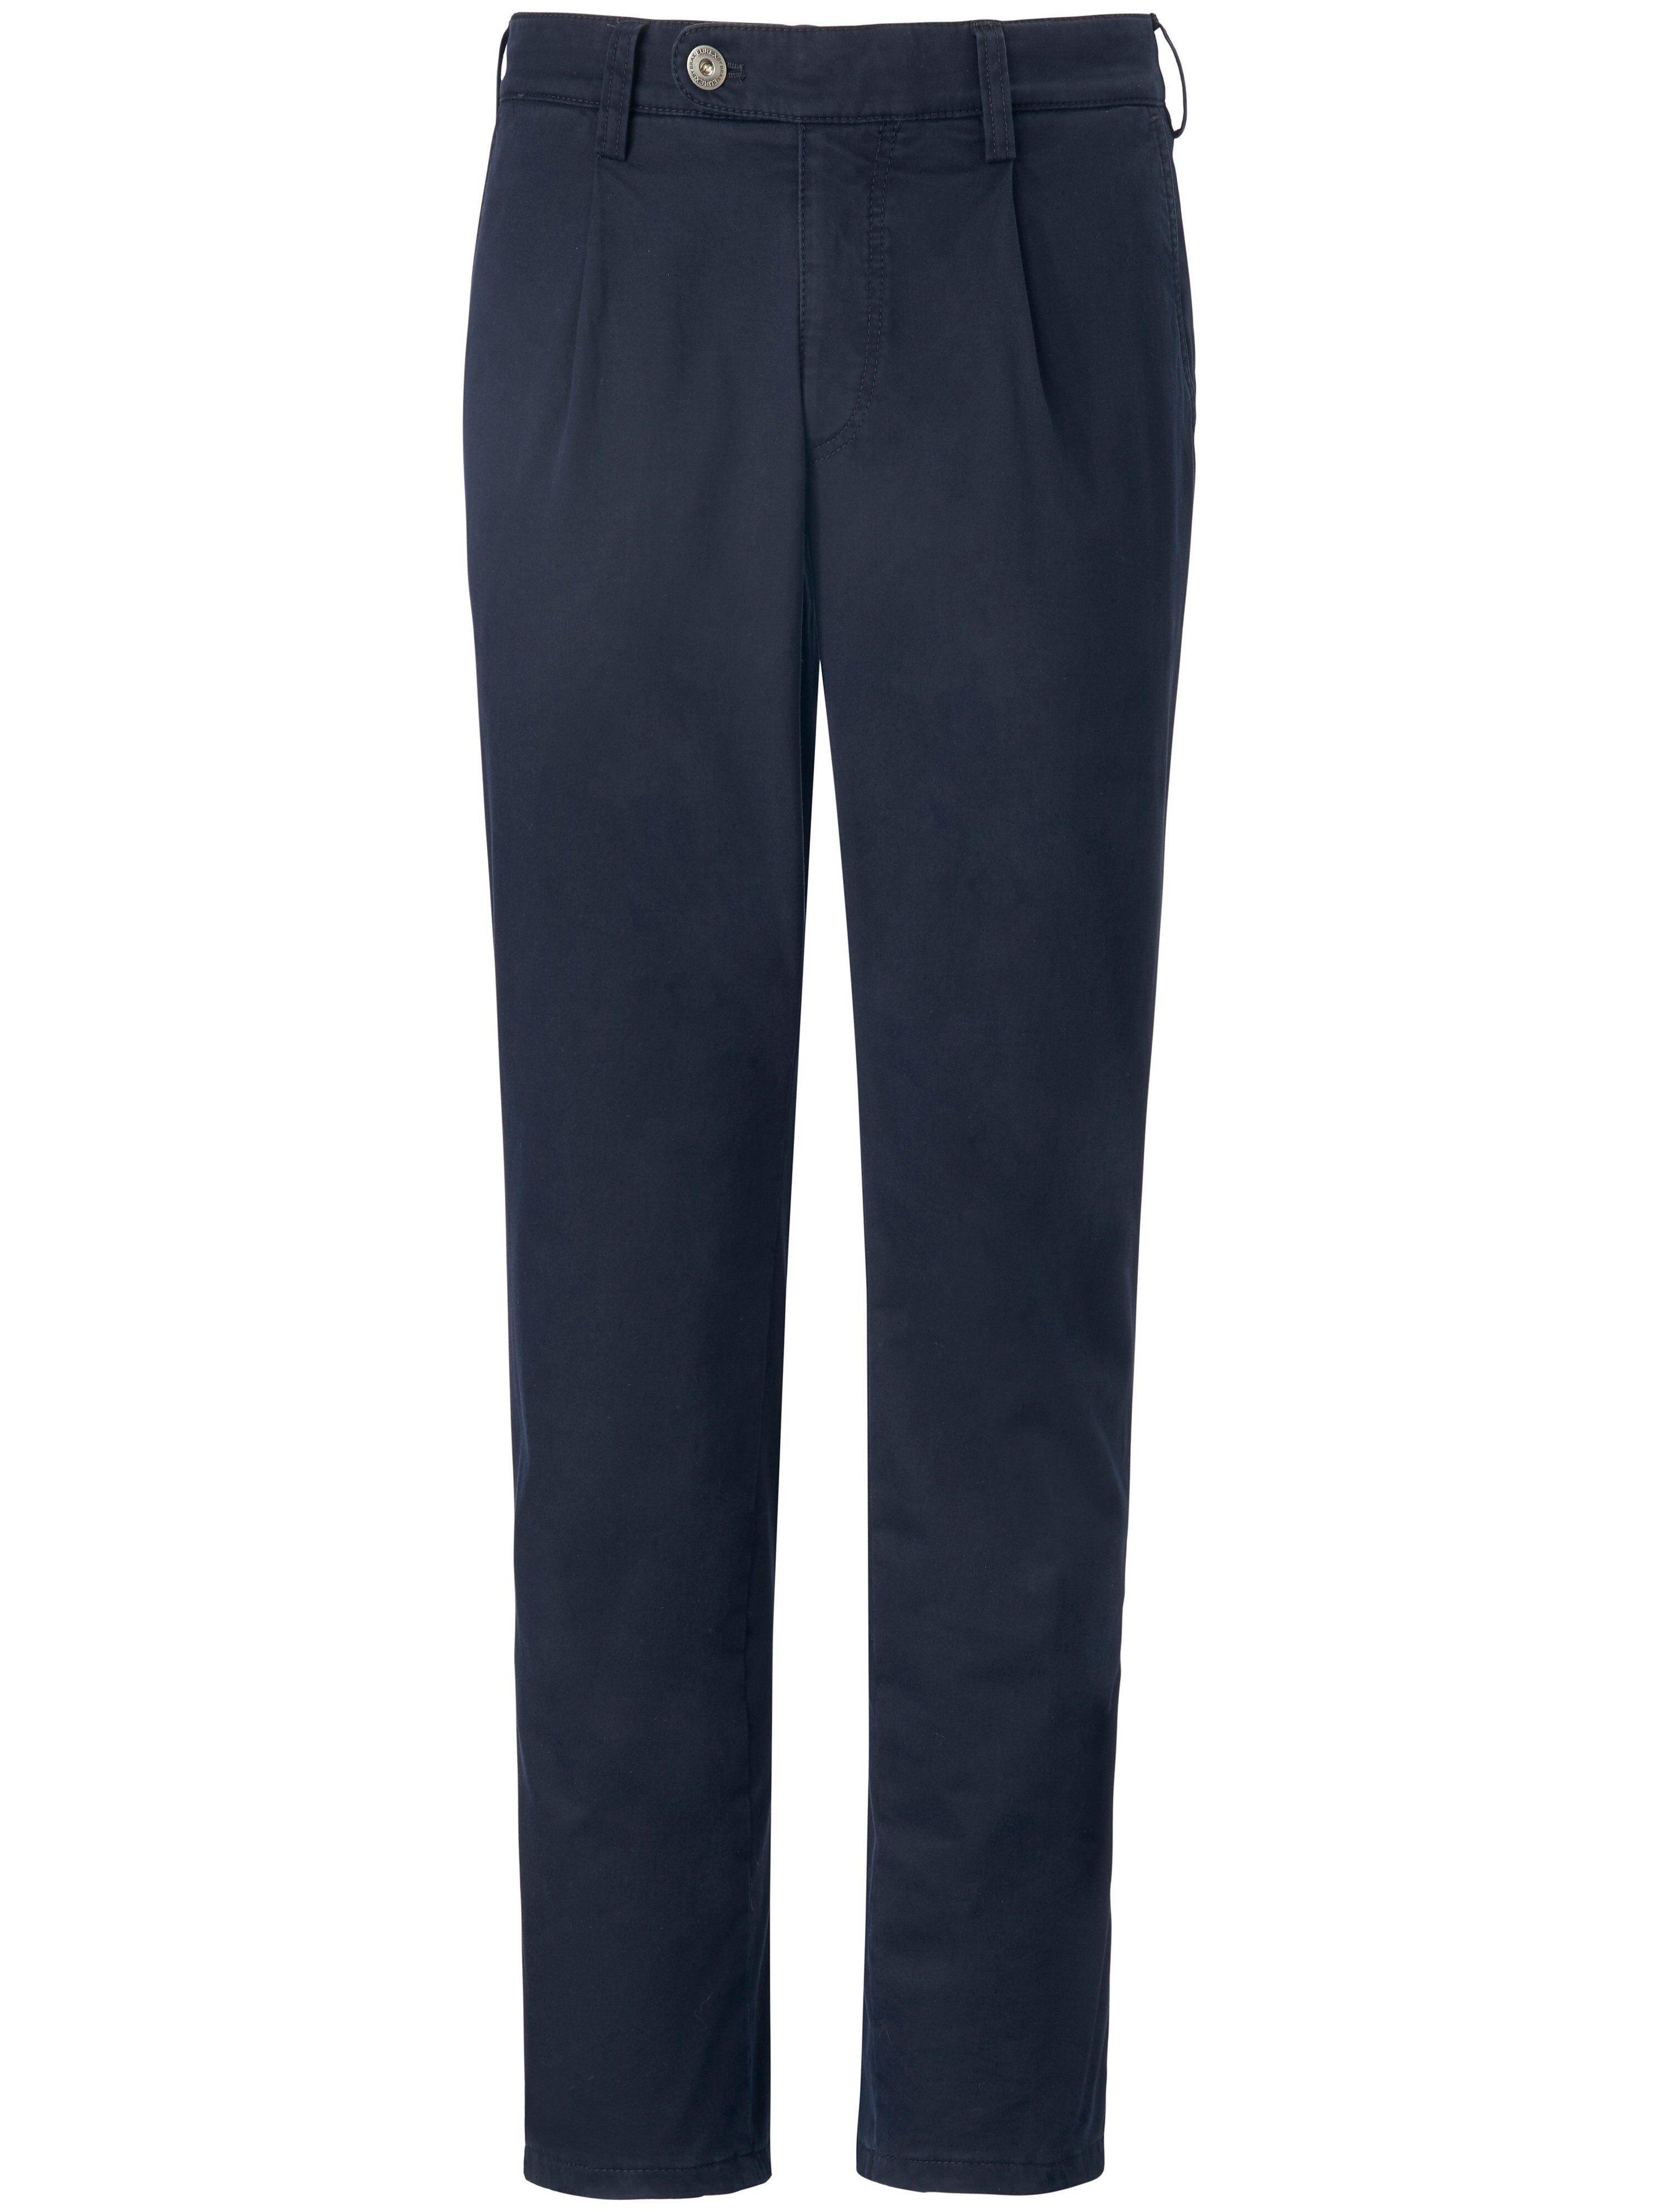 Brax La pantalon chaud à pinces modèle Luis  Eurex by Brax bleu  - Homme - 25